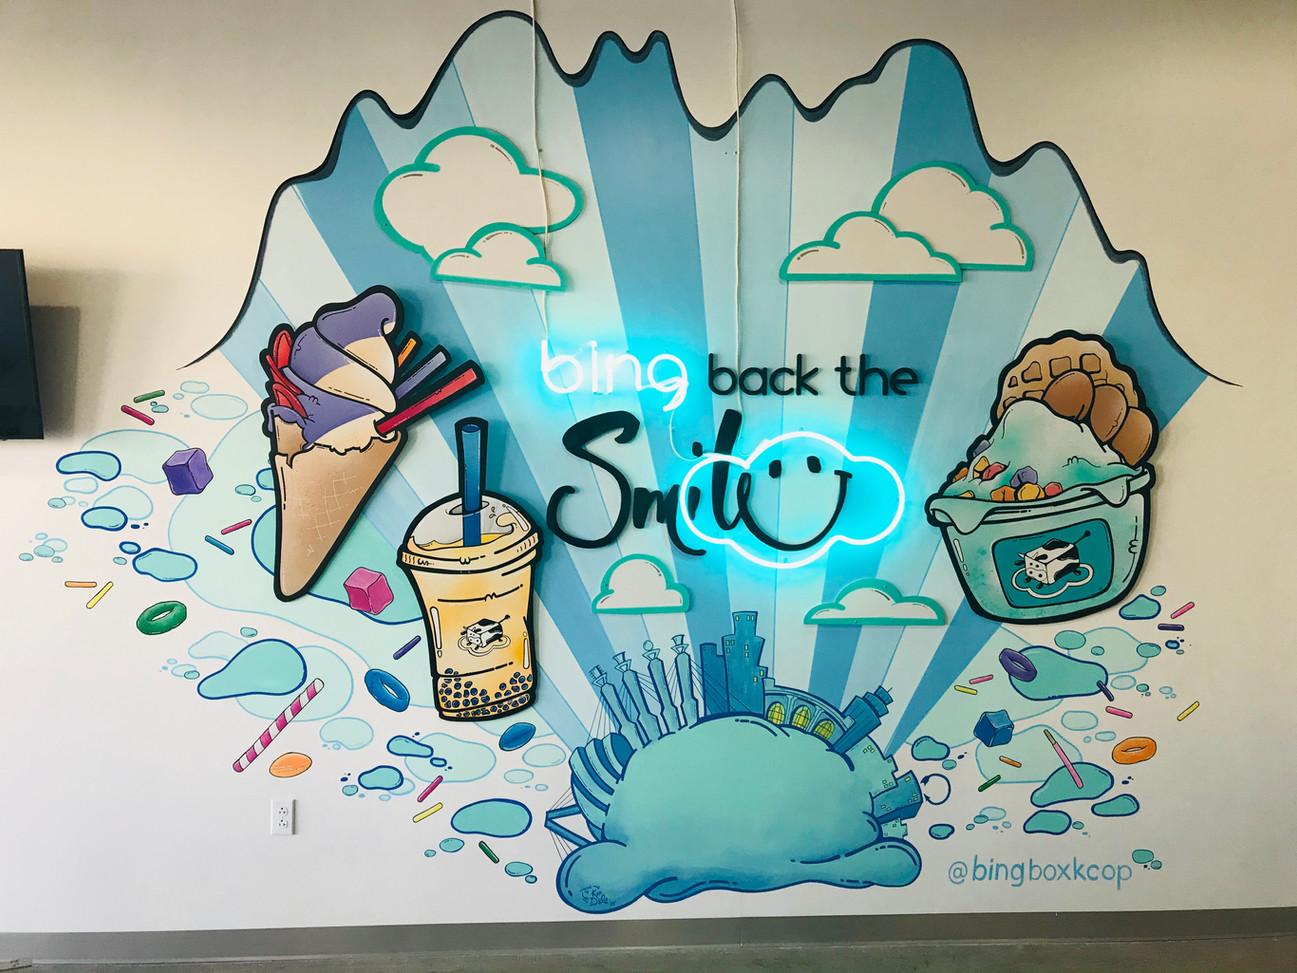 Bing Box mural